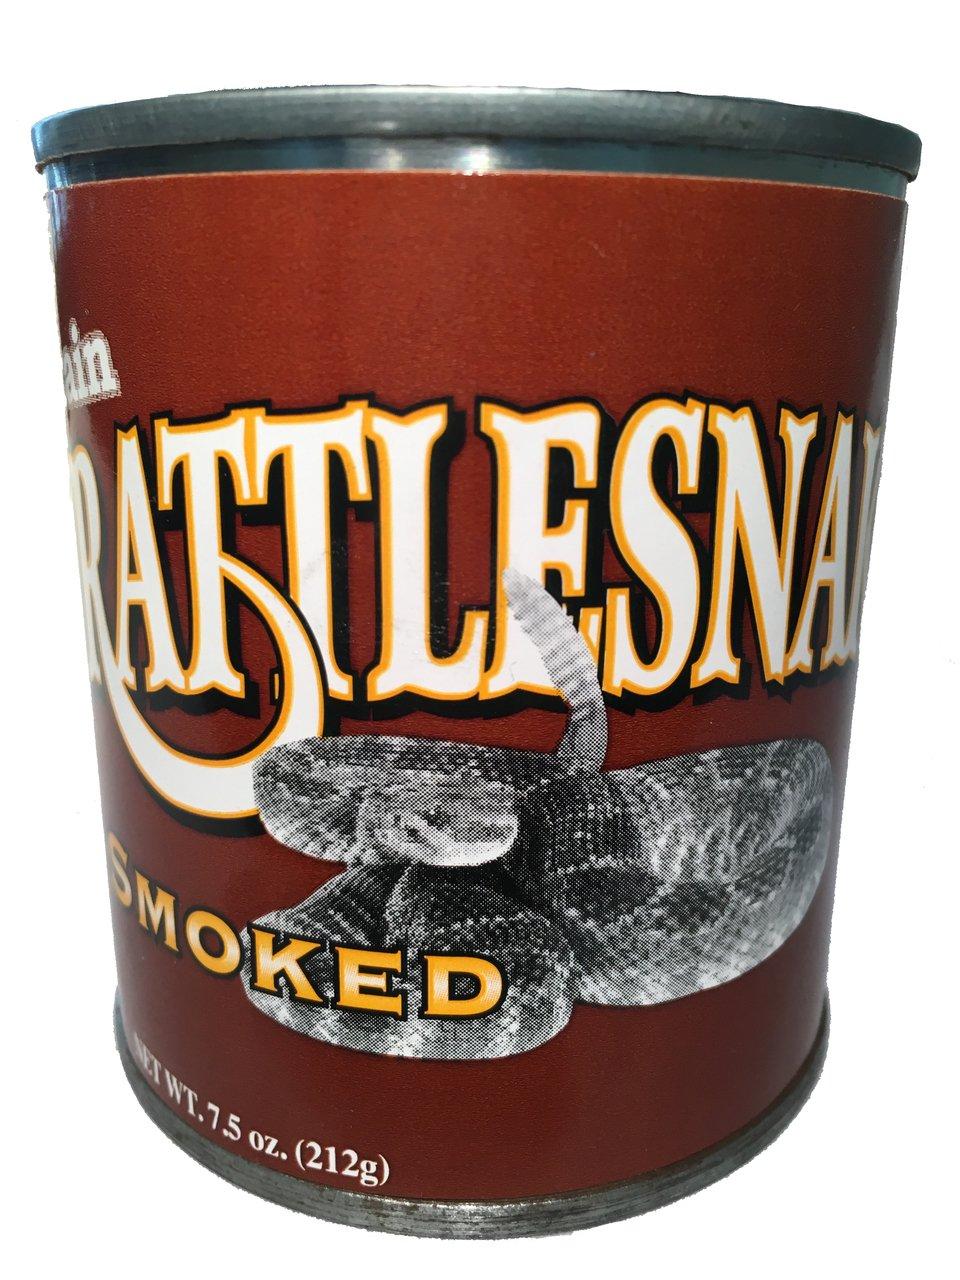 Canned Edible Smoked Rattlesnake